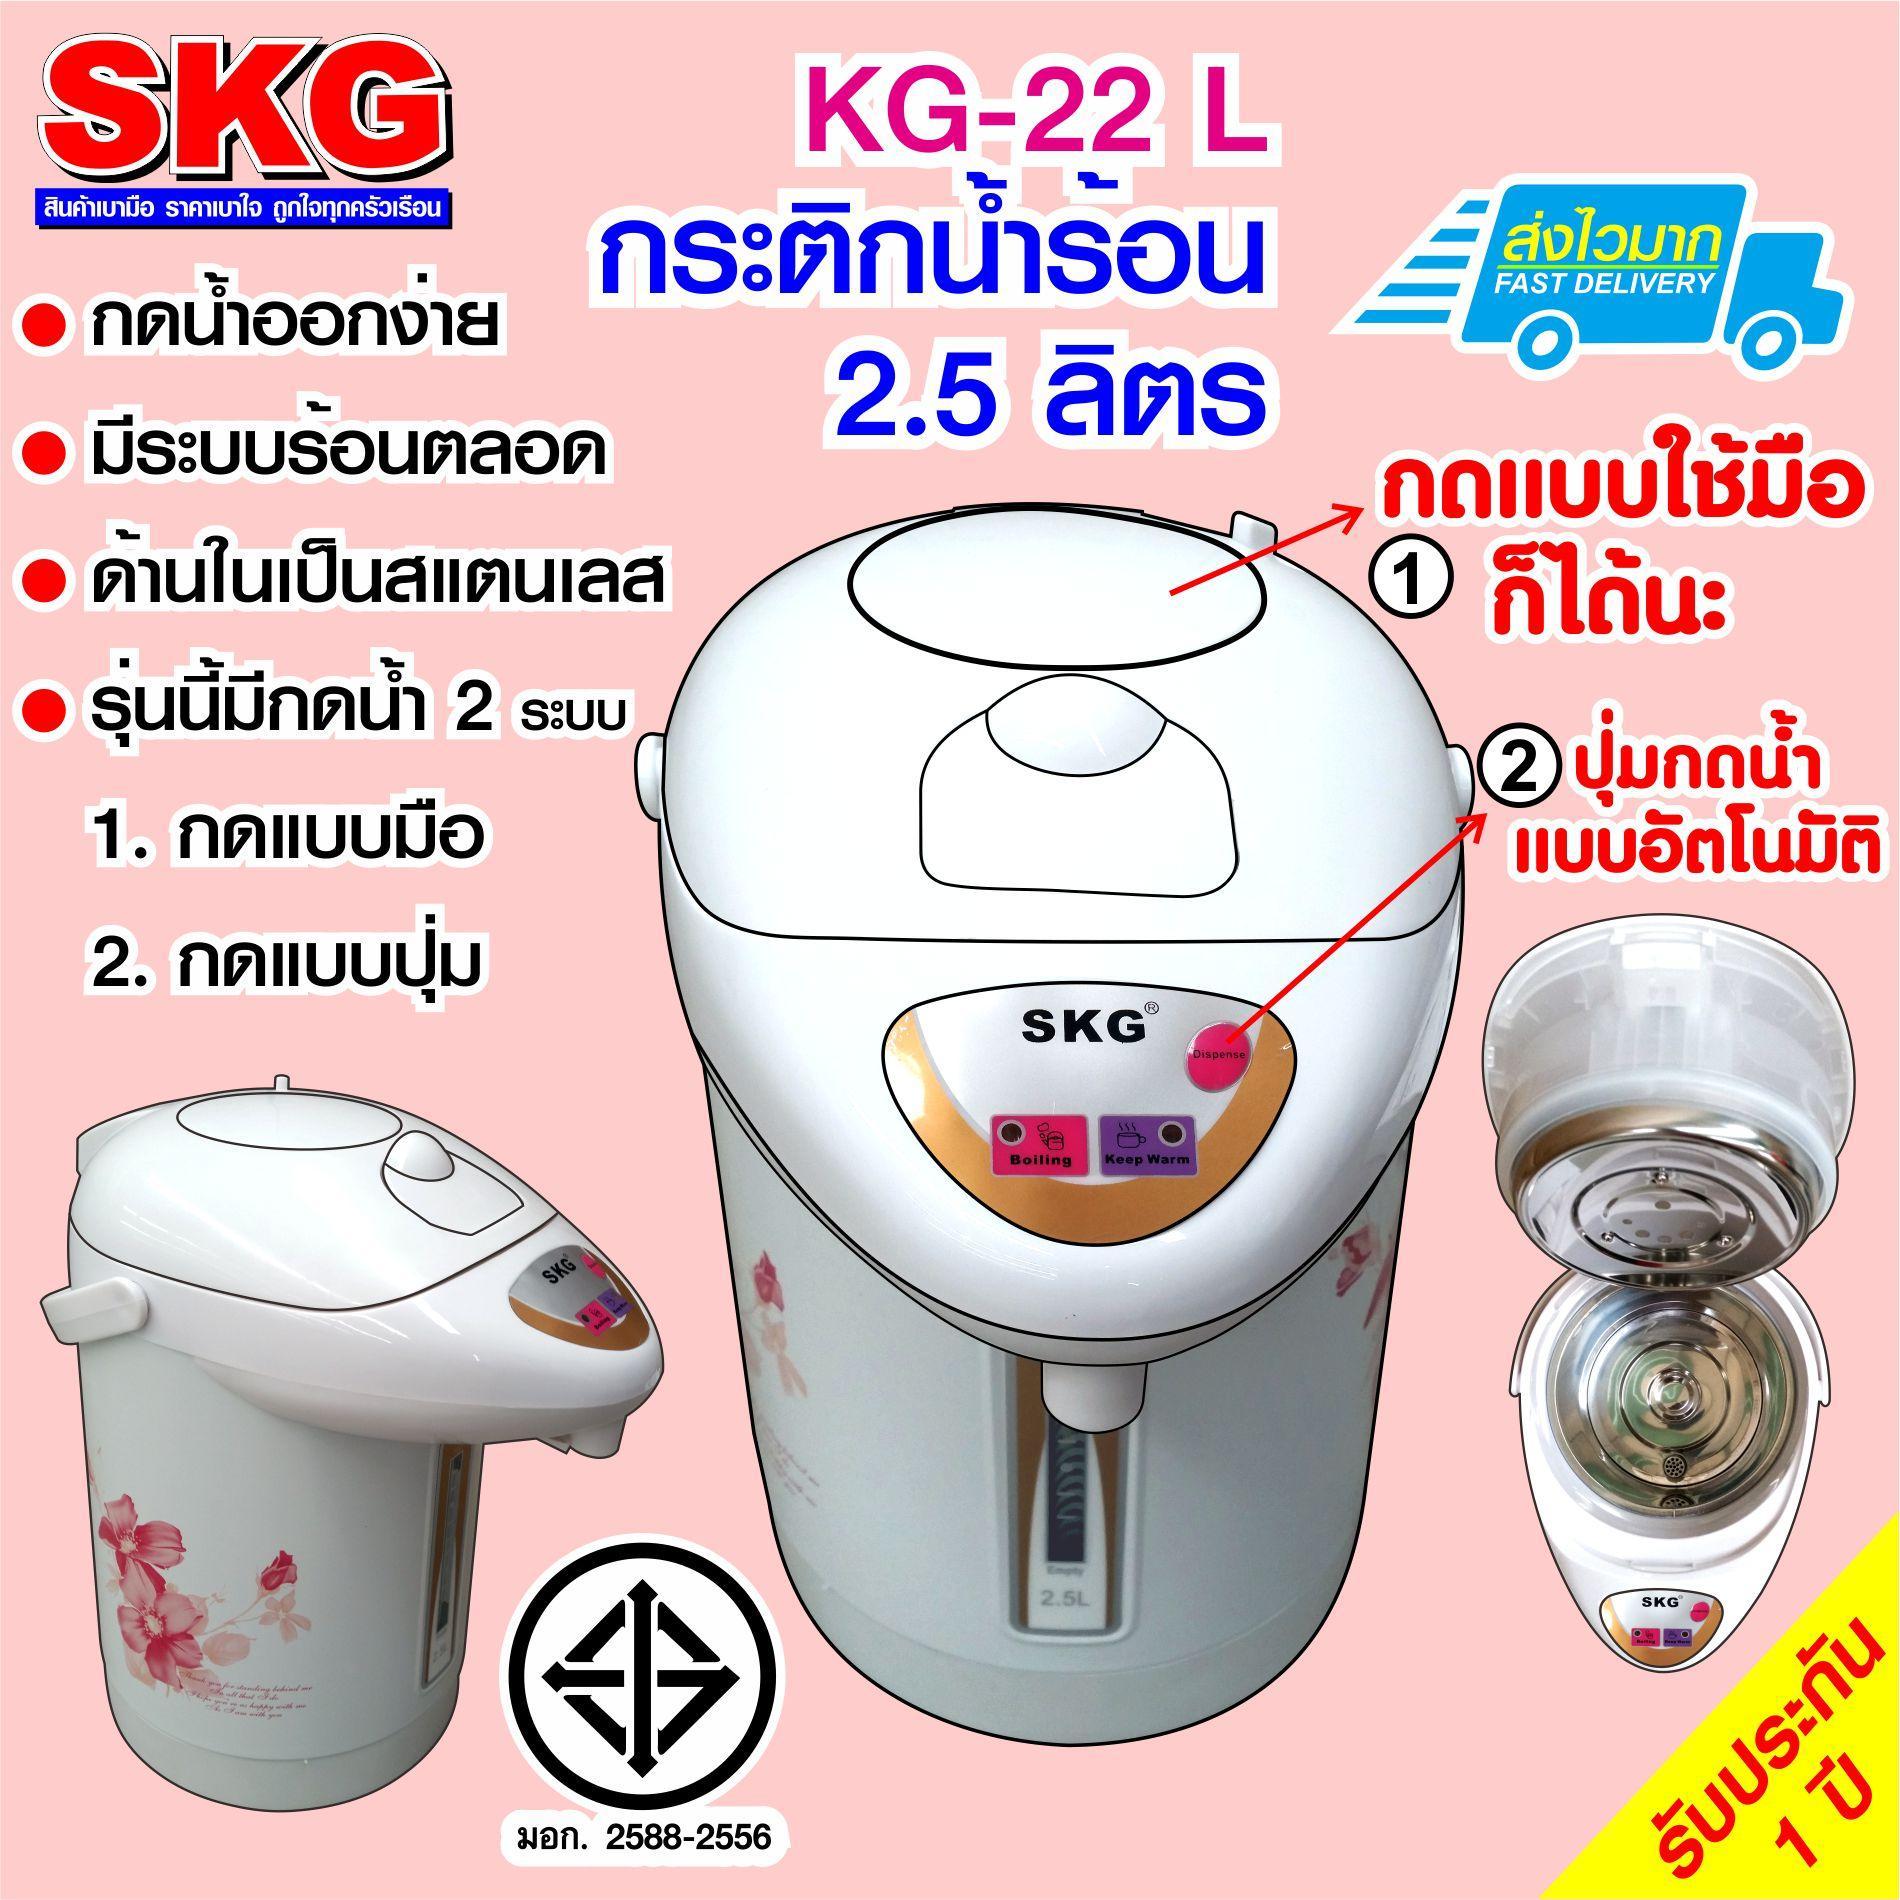 KG-22L